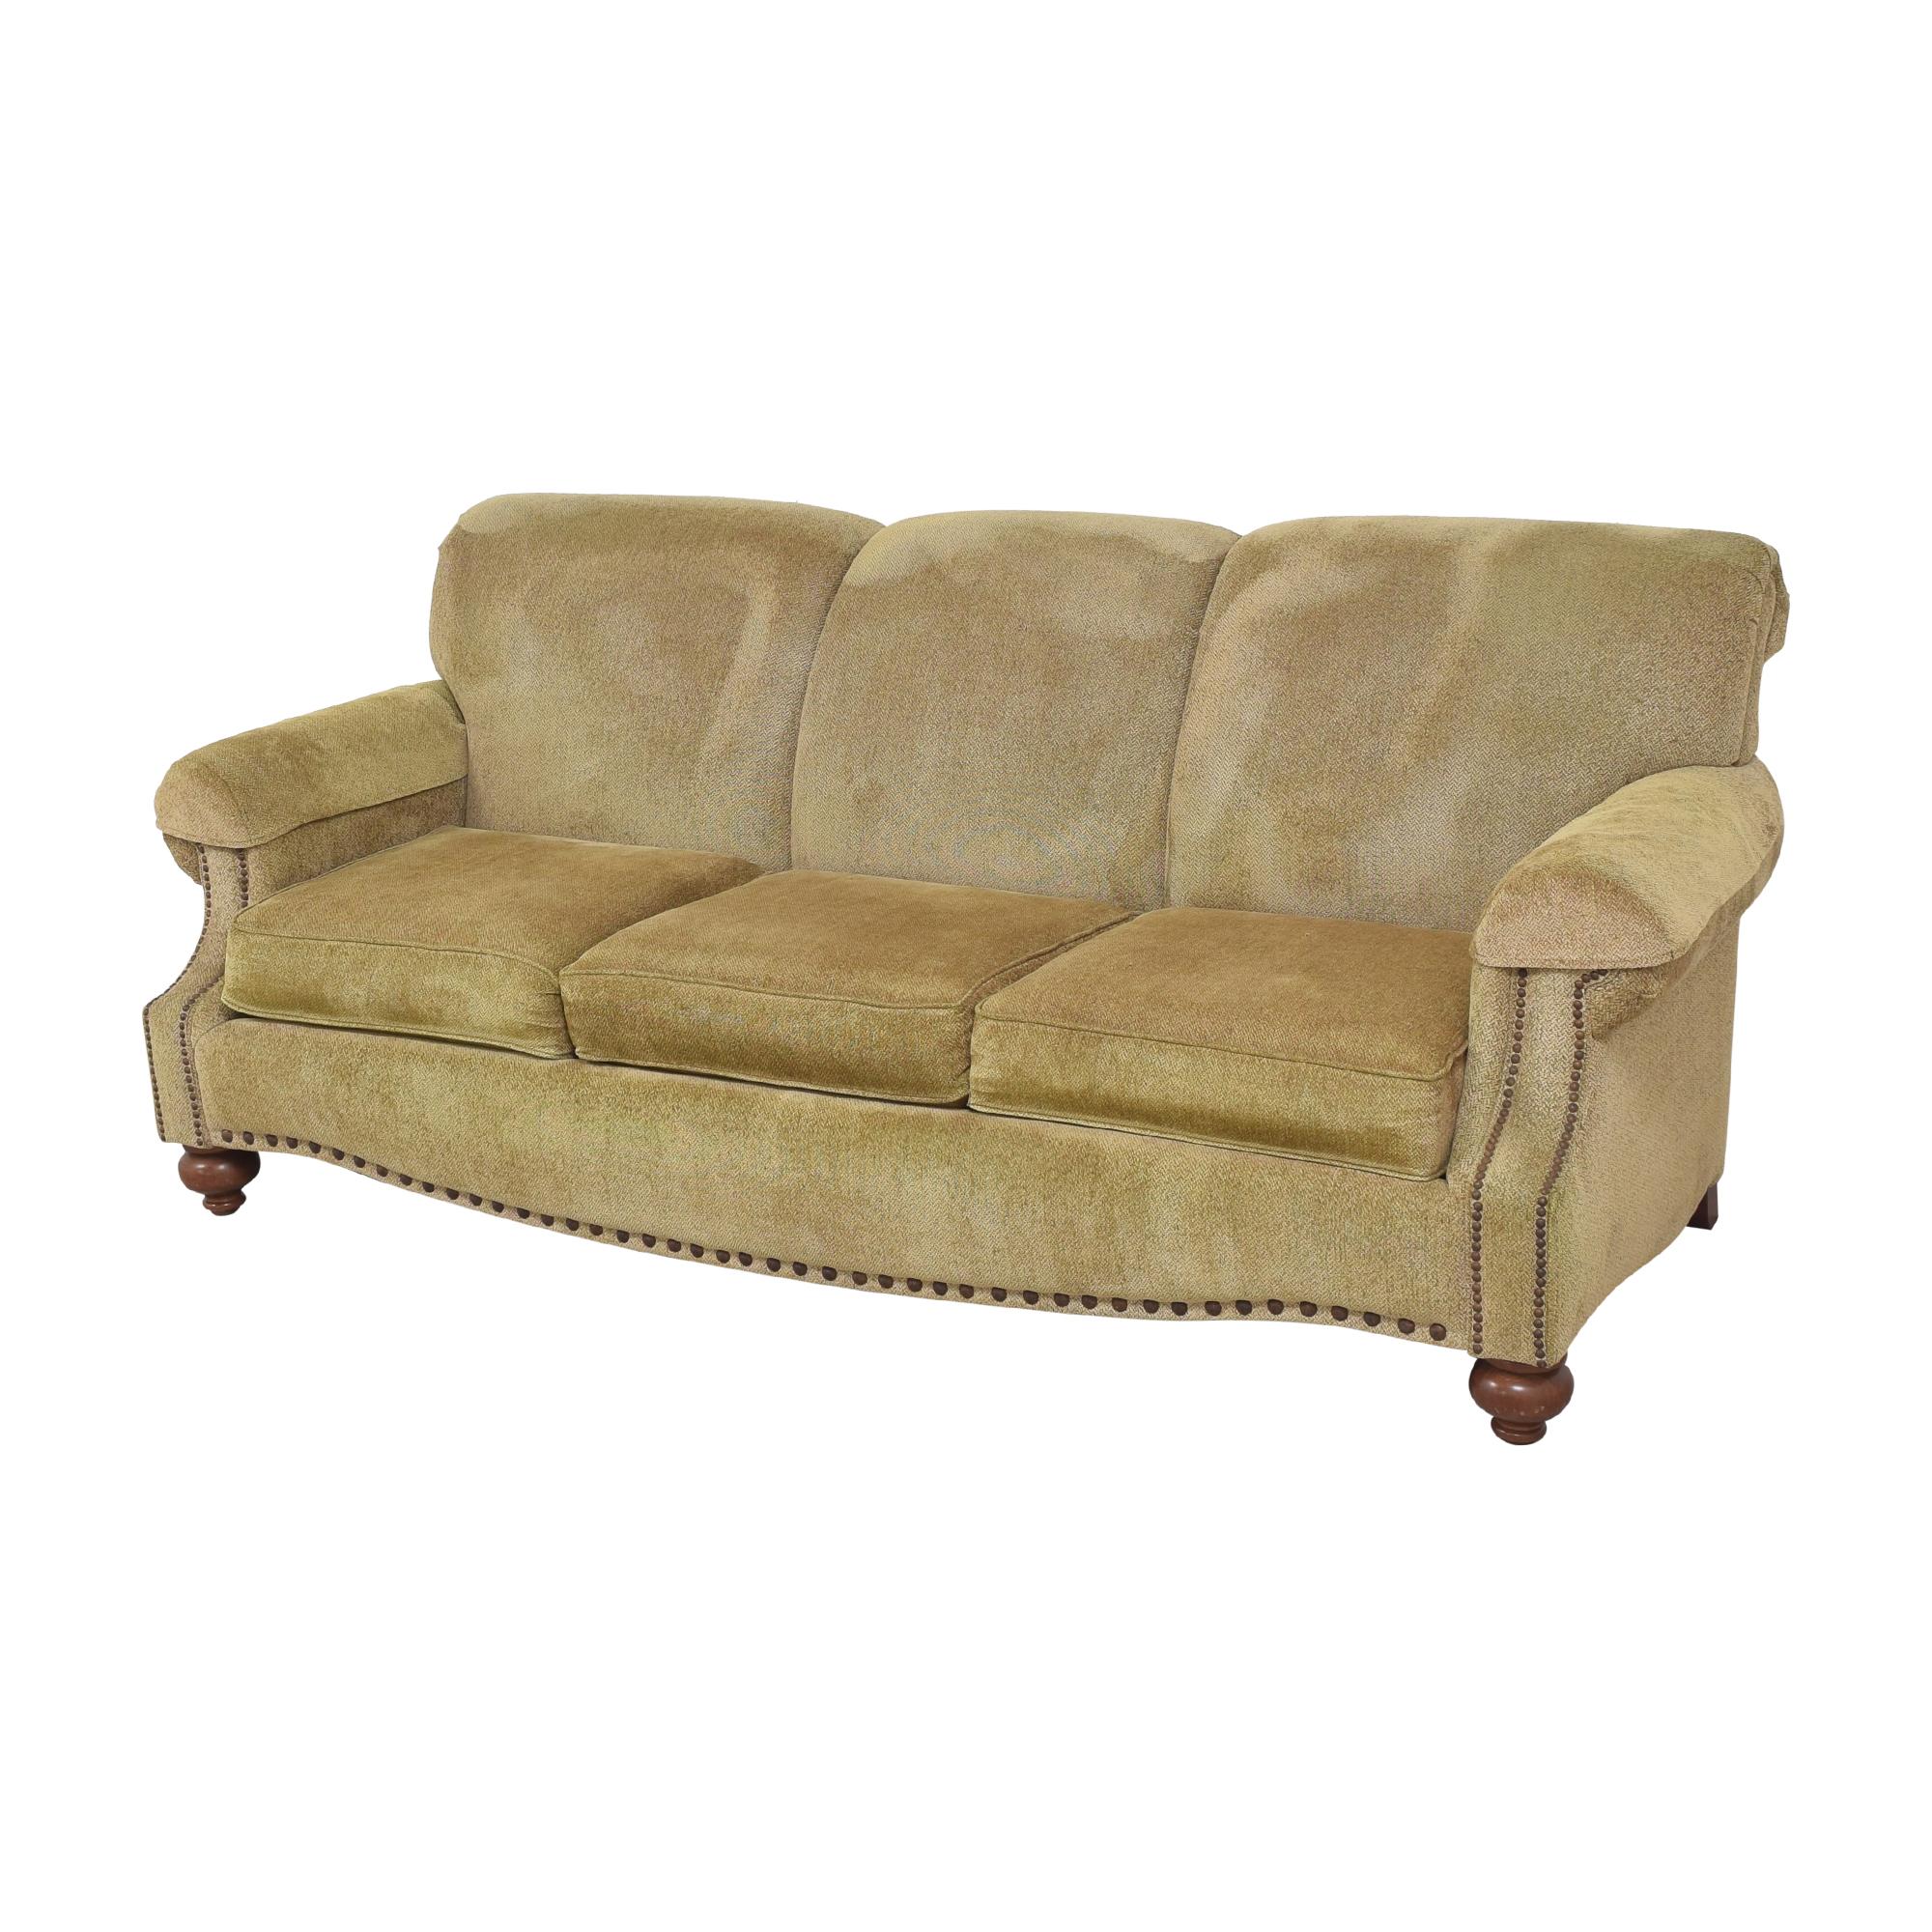 Bassett Furniture Bassett Furniture Three Cushion Nailhead Sofa coupon